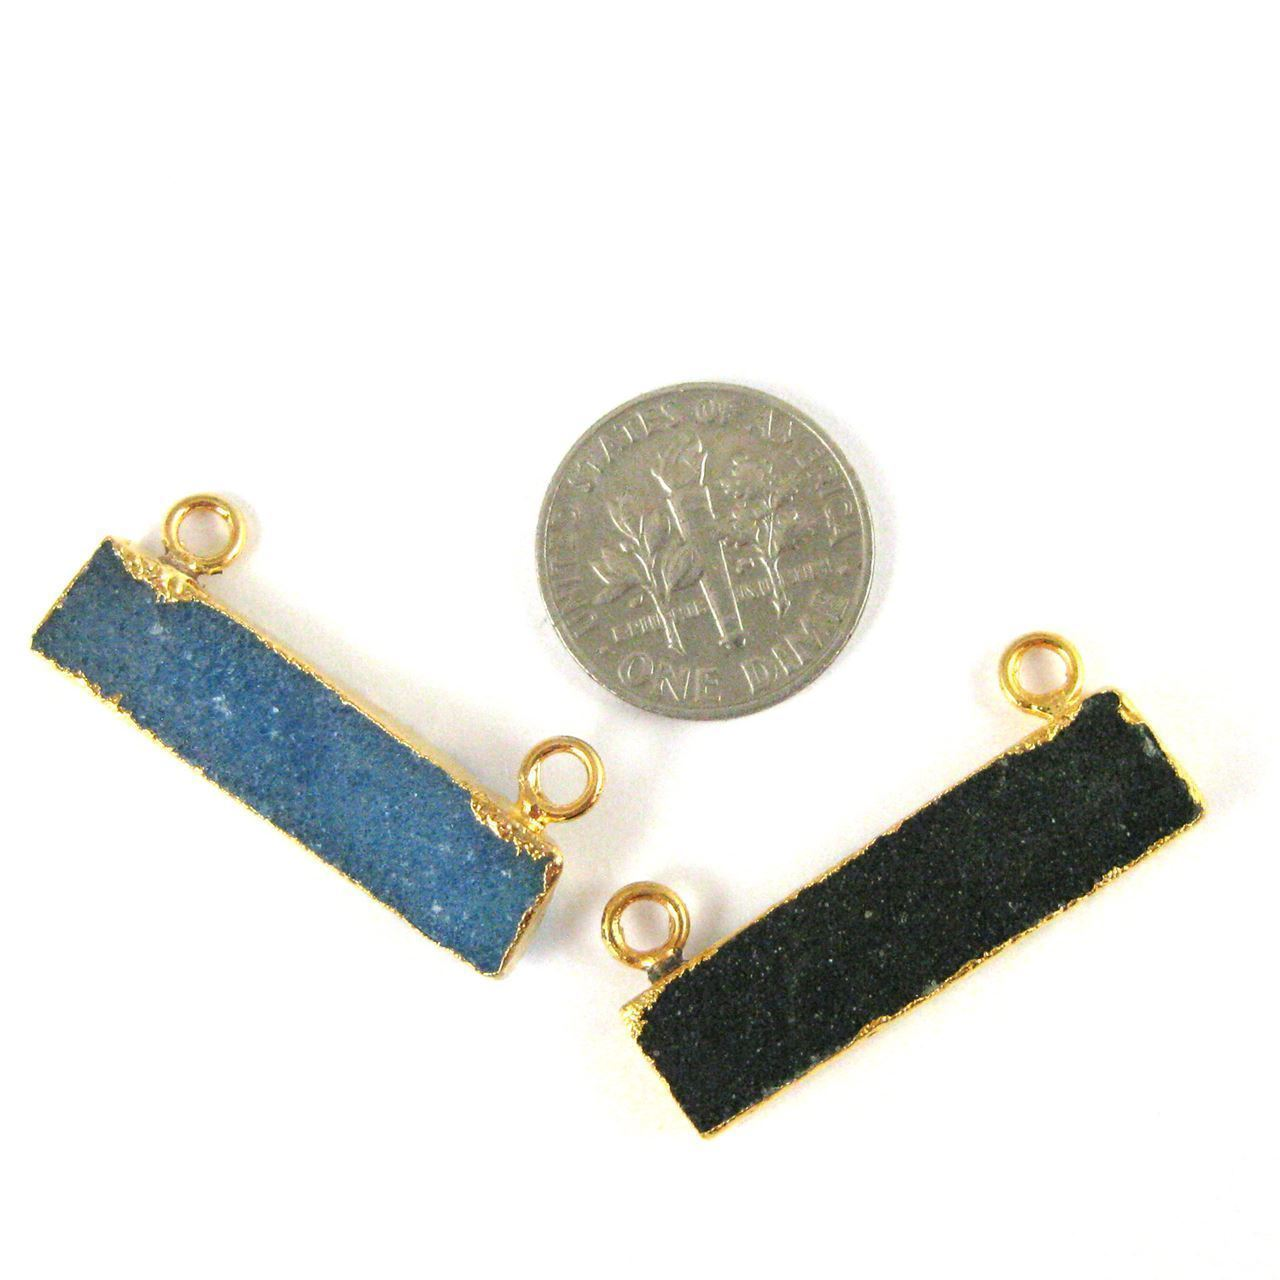 Natural Druzy Agate Bar Connector Pendant, 24K Gold plated Long Horizontal Bar- Grey